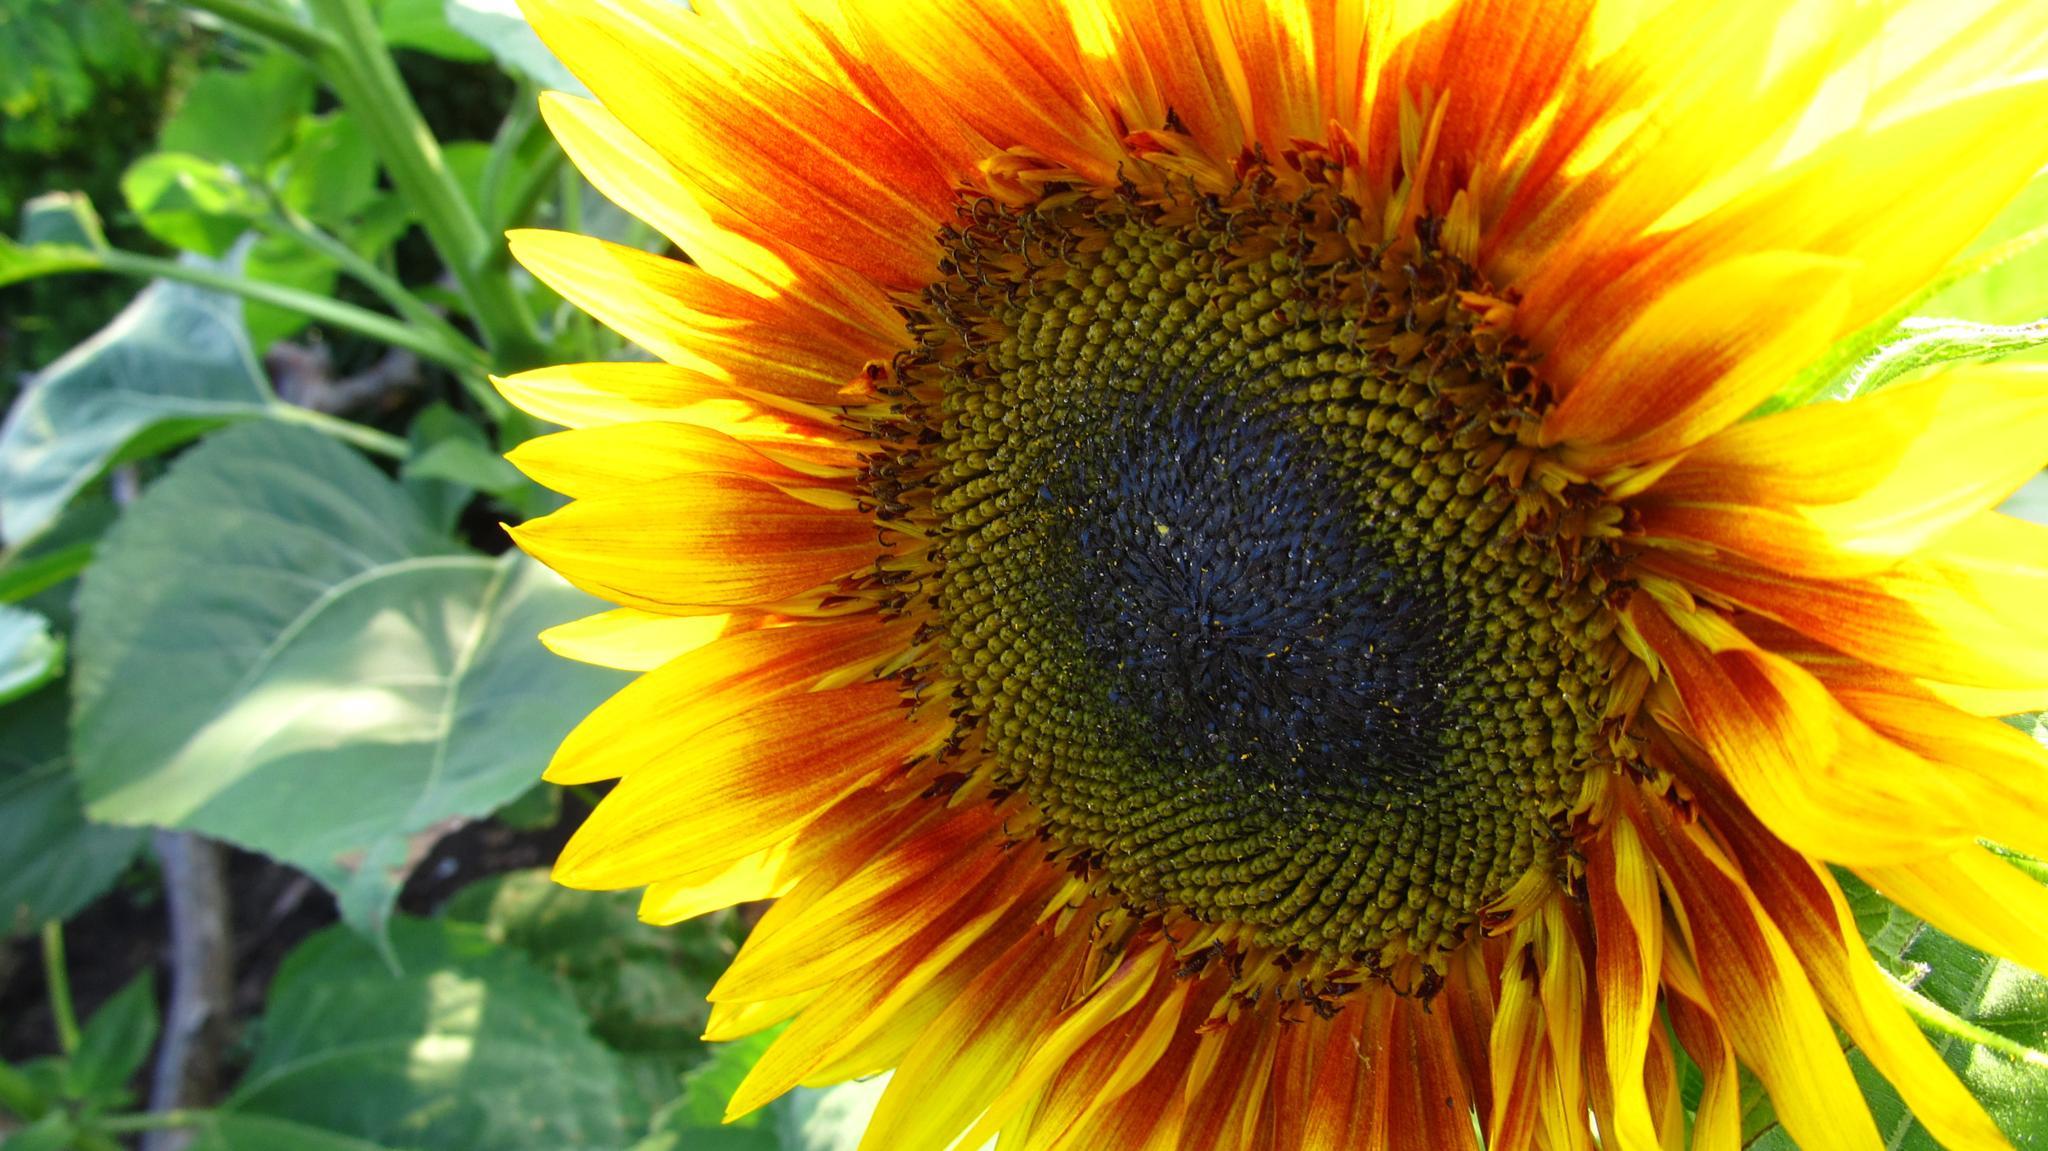 Sunflower by simonp